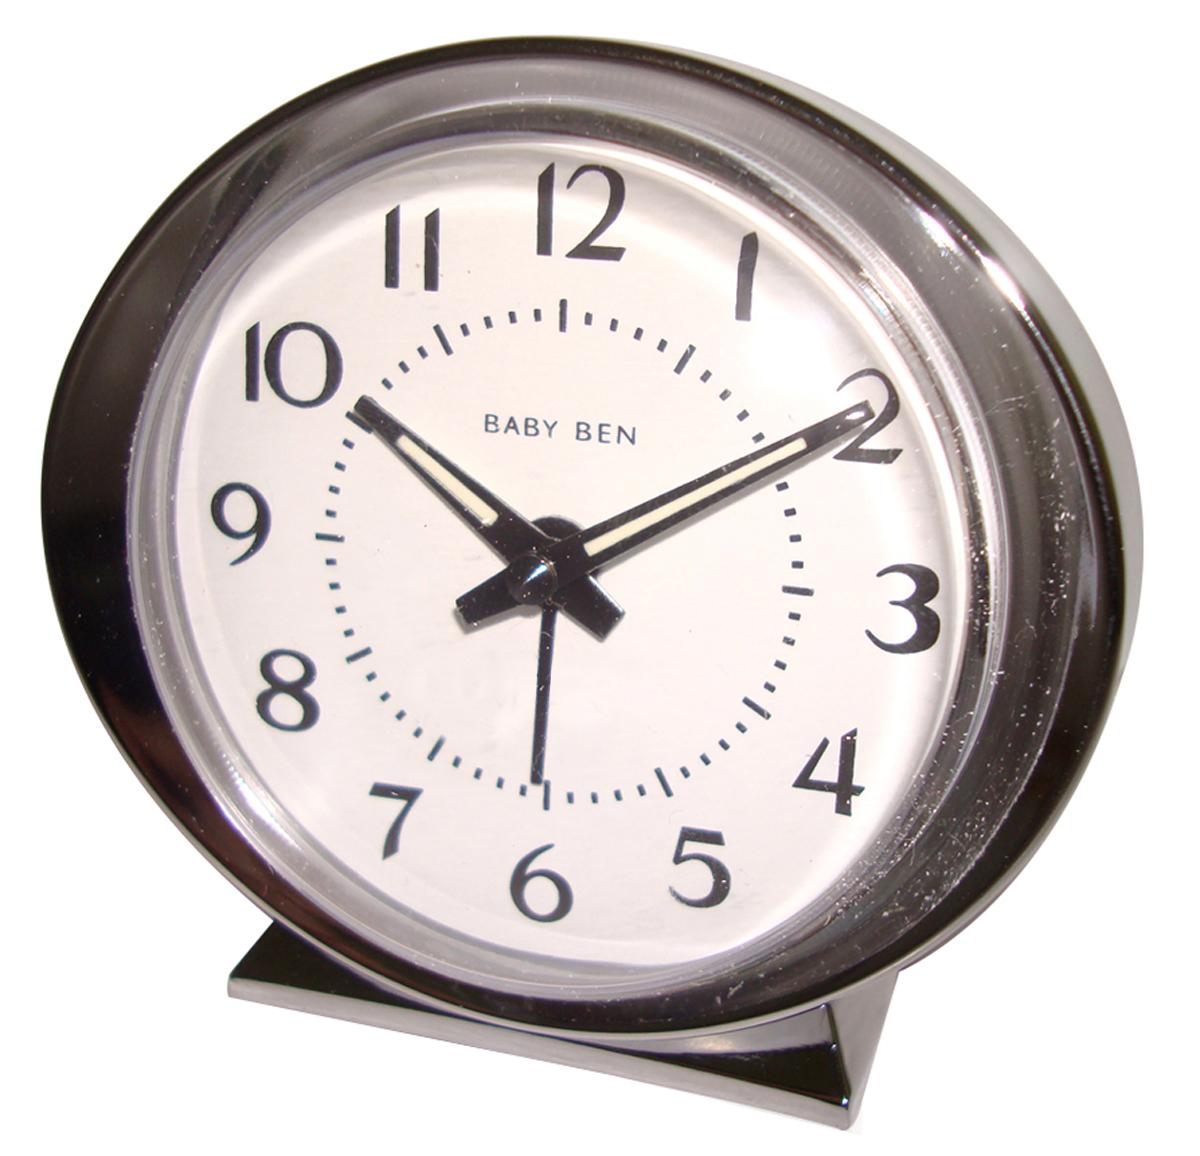 Westclox 1964 Baby Ben Classic Analog Battery Alarm Clock Ivory 11611QA 11611QA